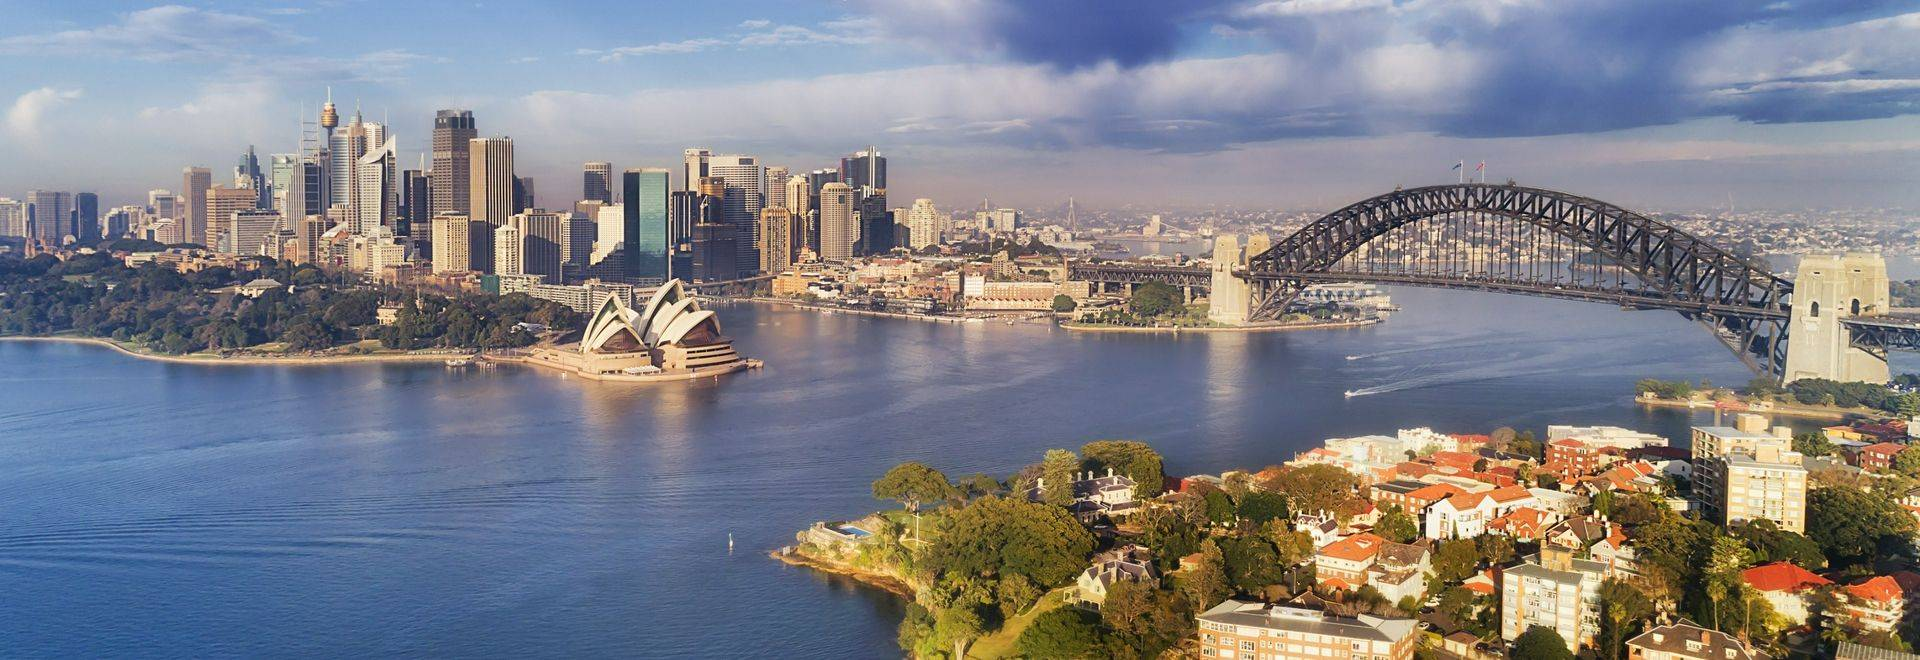 Quiet still earlier morning gentle sun light over Sydney city main landmarks around Harbour waters and shores between CBD an…